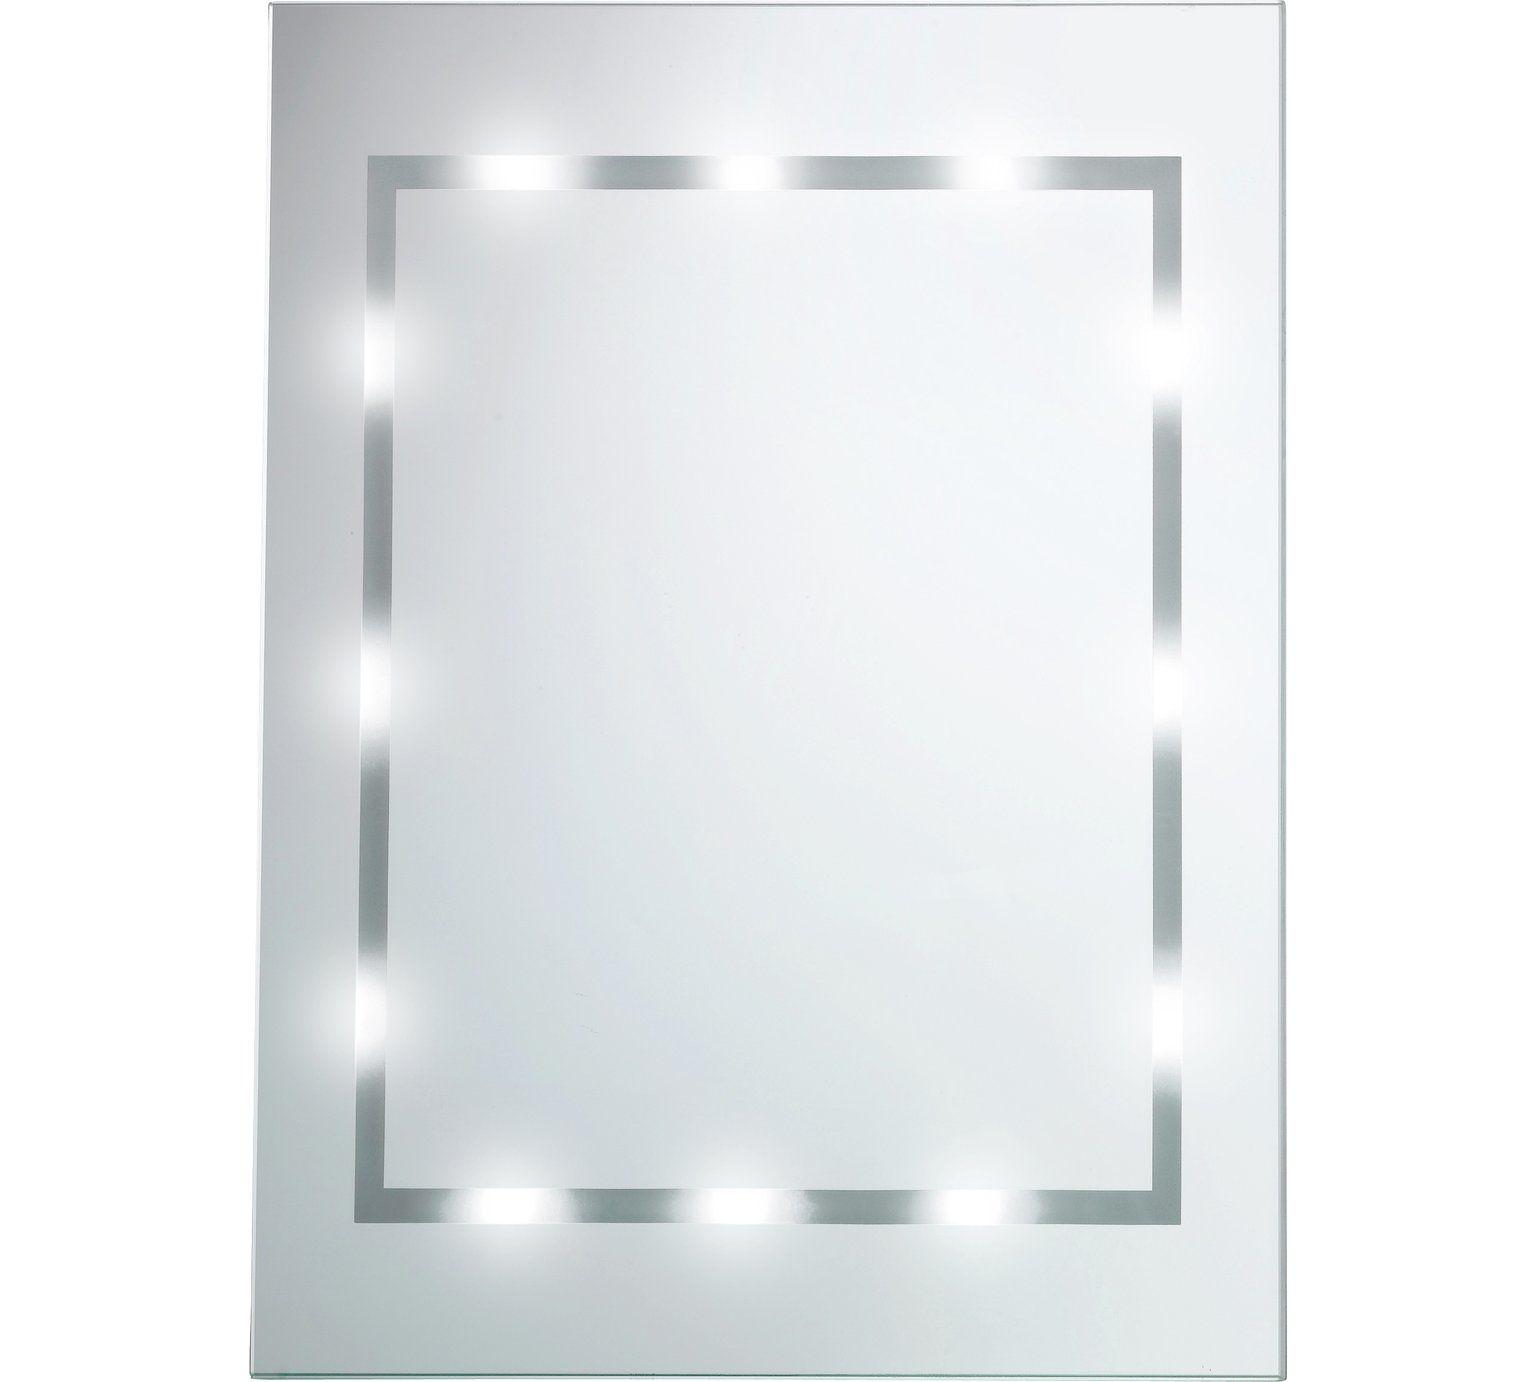 Buy Argos Home Illuminated Bathroom Mirror White Gloss Mirrors Argos Argos Home Bathroom Mirror Mirror